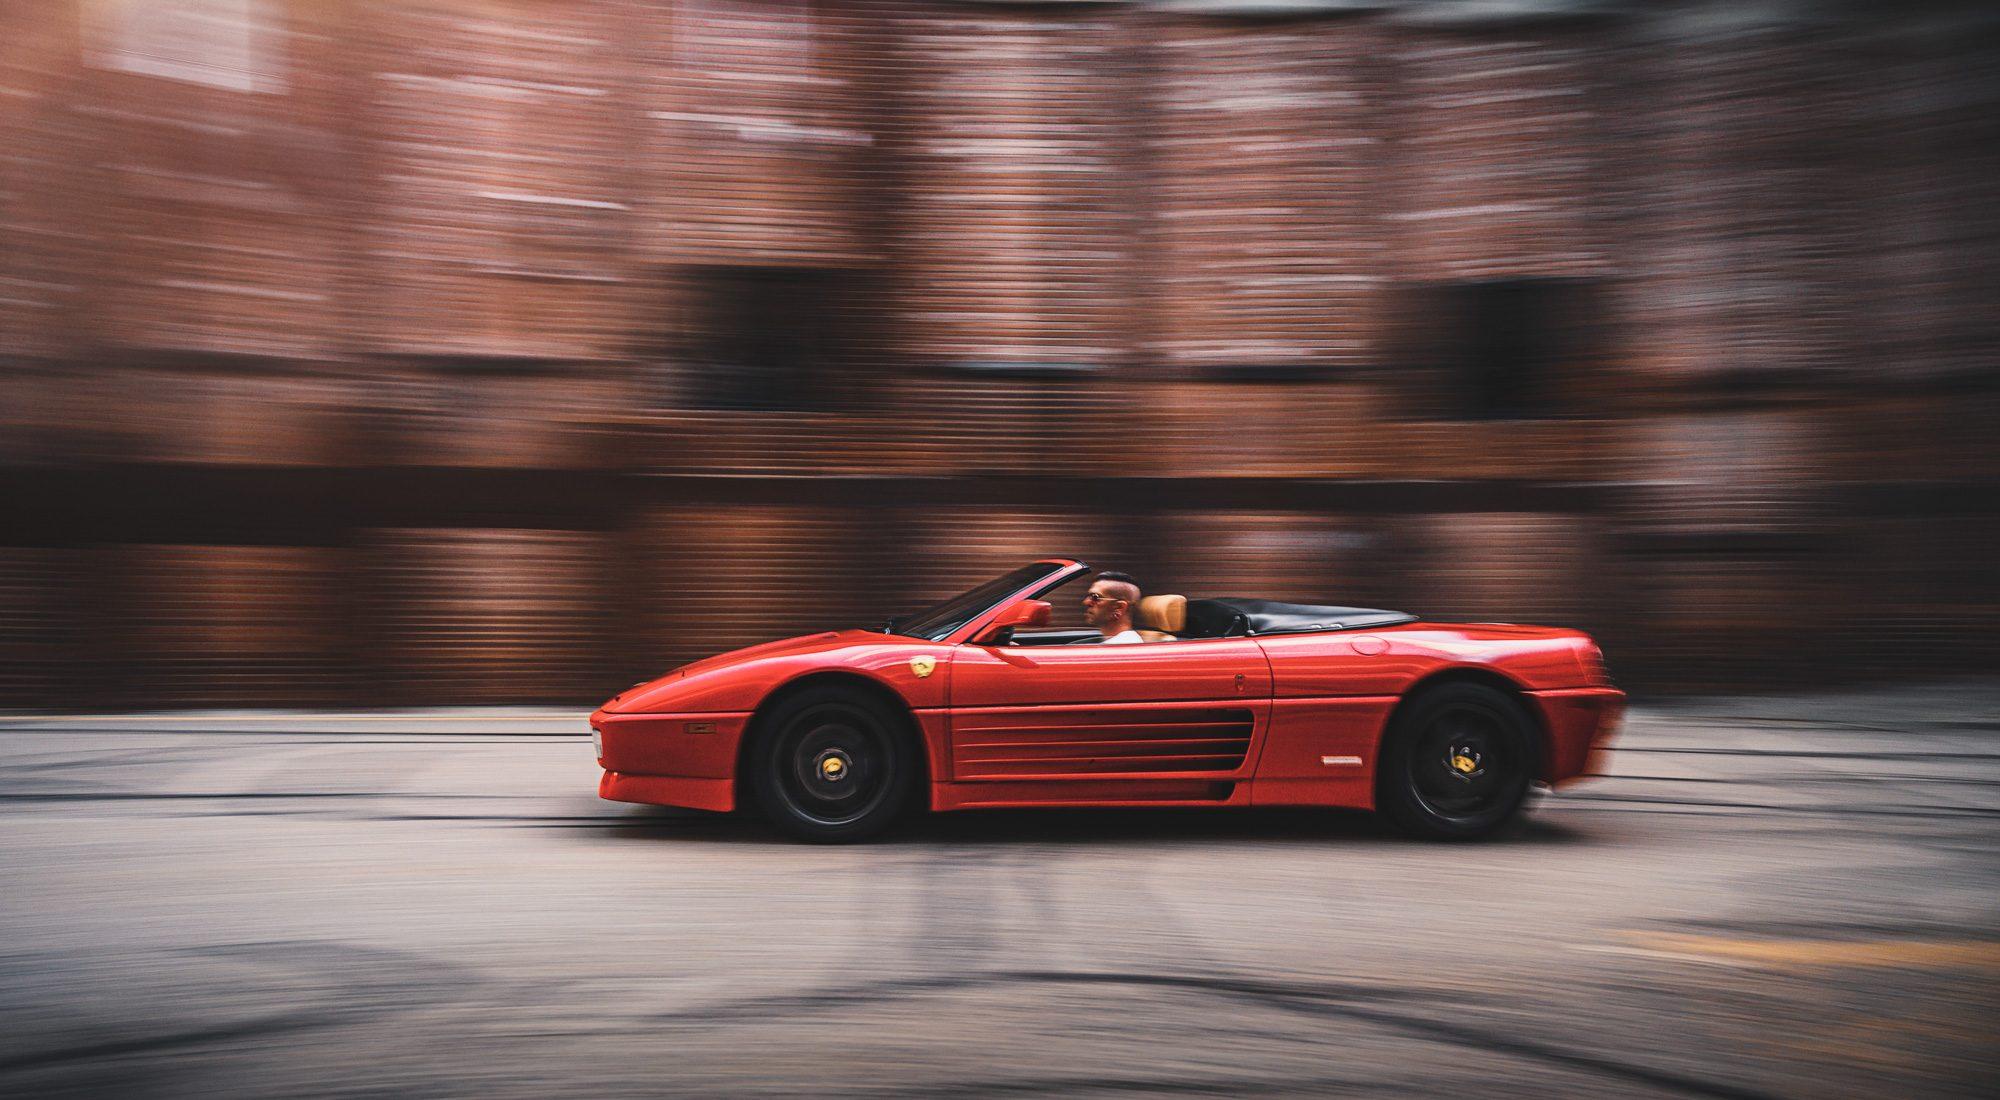 Tutorial: How I shot the Ferrari 348, and shooting a car twice.